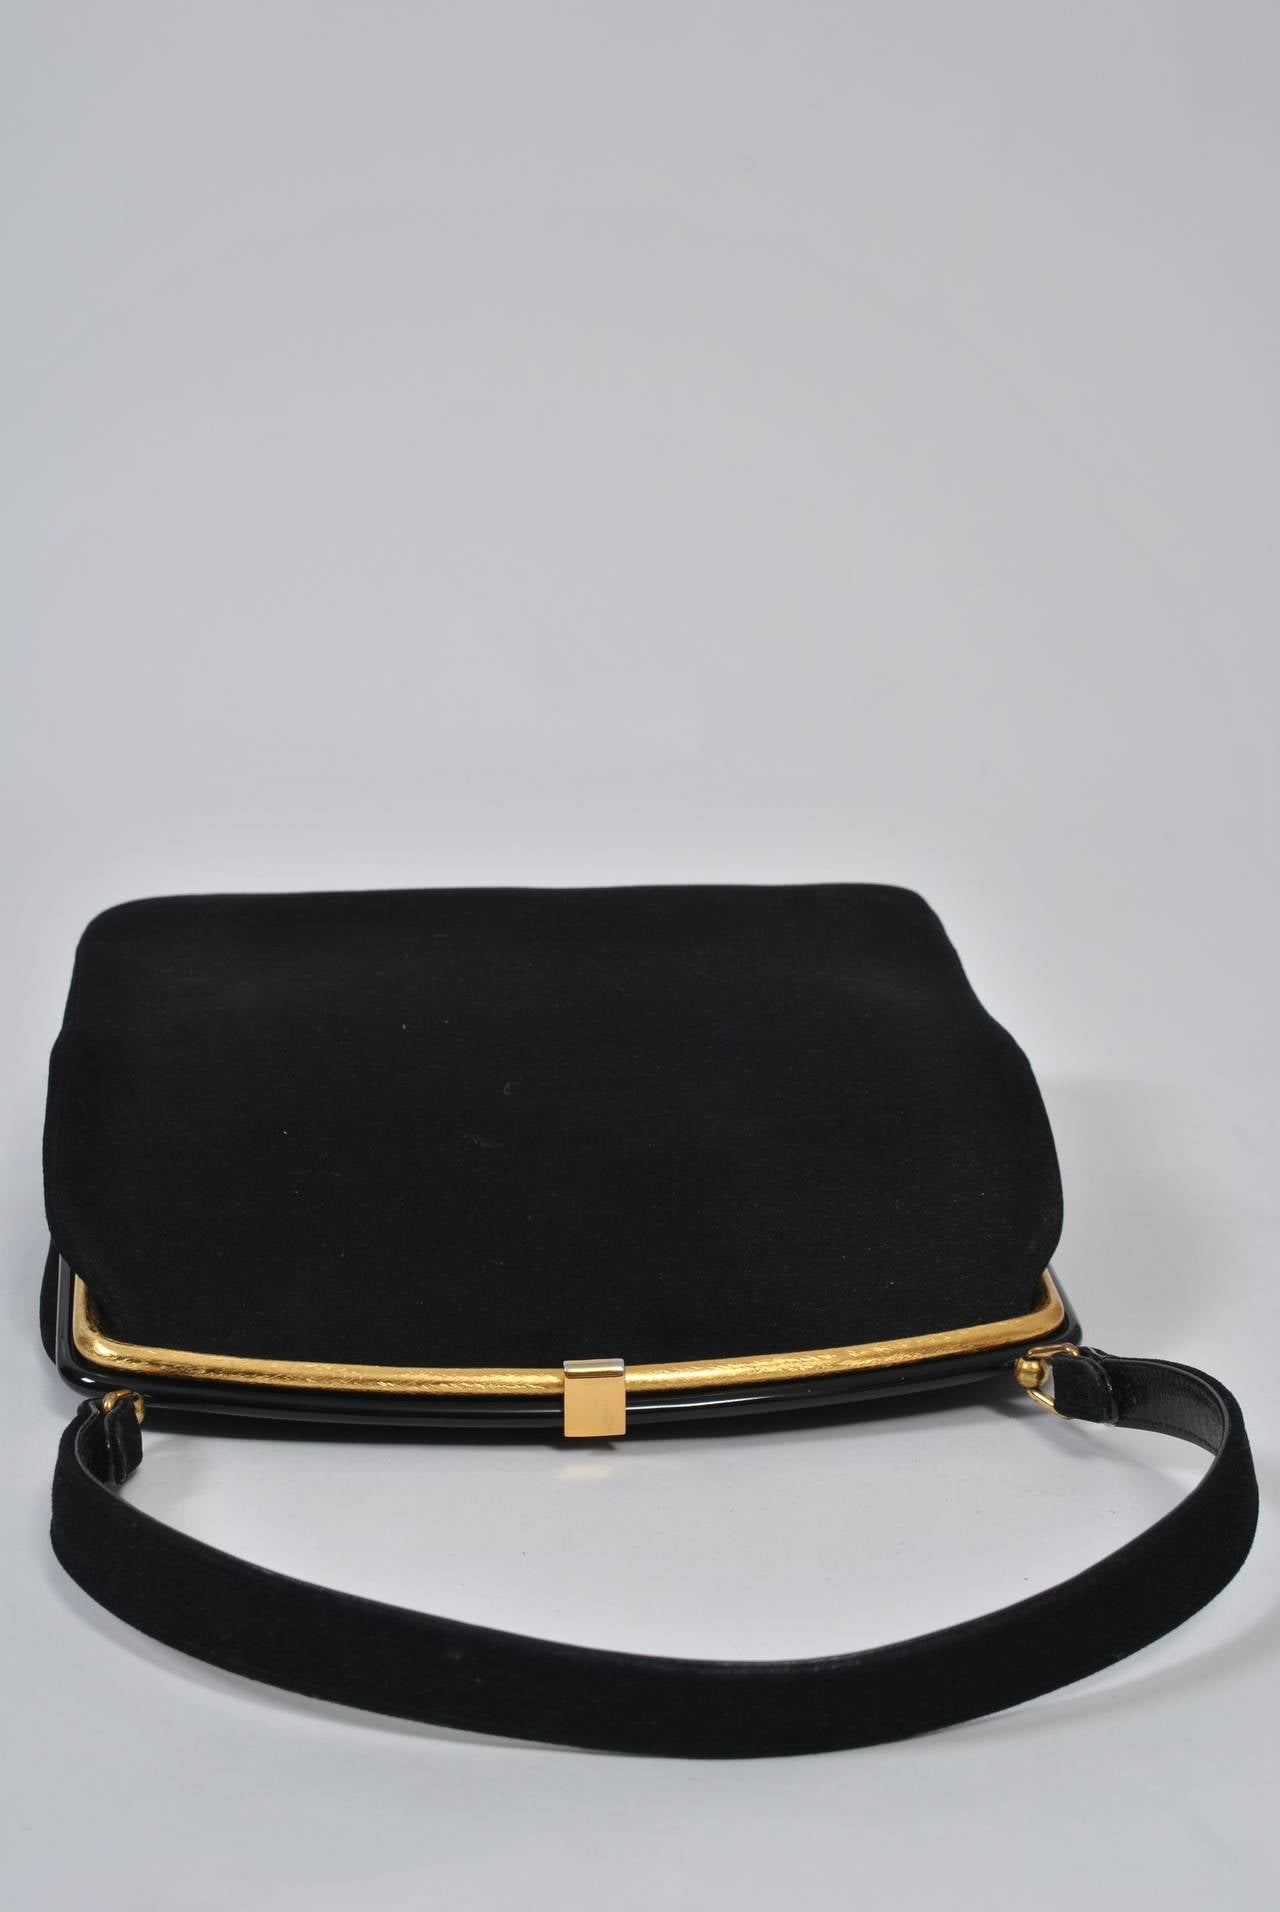 Coblentz 1960s Black Suede Handbag 2